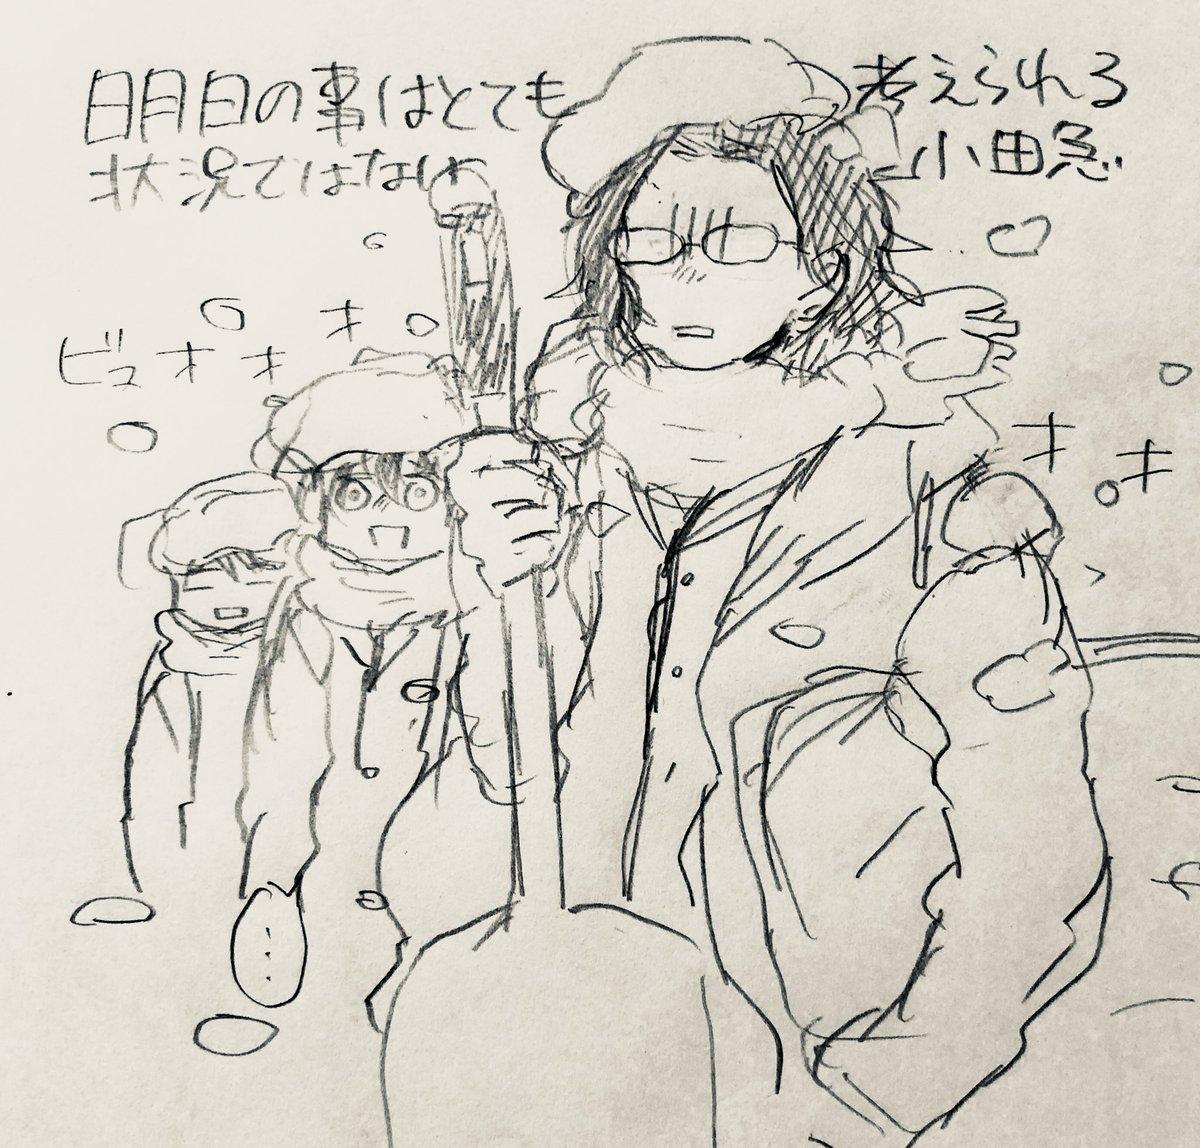 RT @hzmnt: 本日のMVP賞(本当お疲れ様です……!!!!) https://t.co/jrcm6PVh51